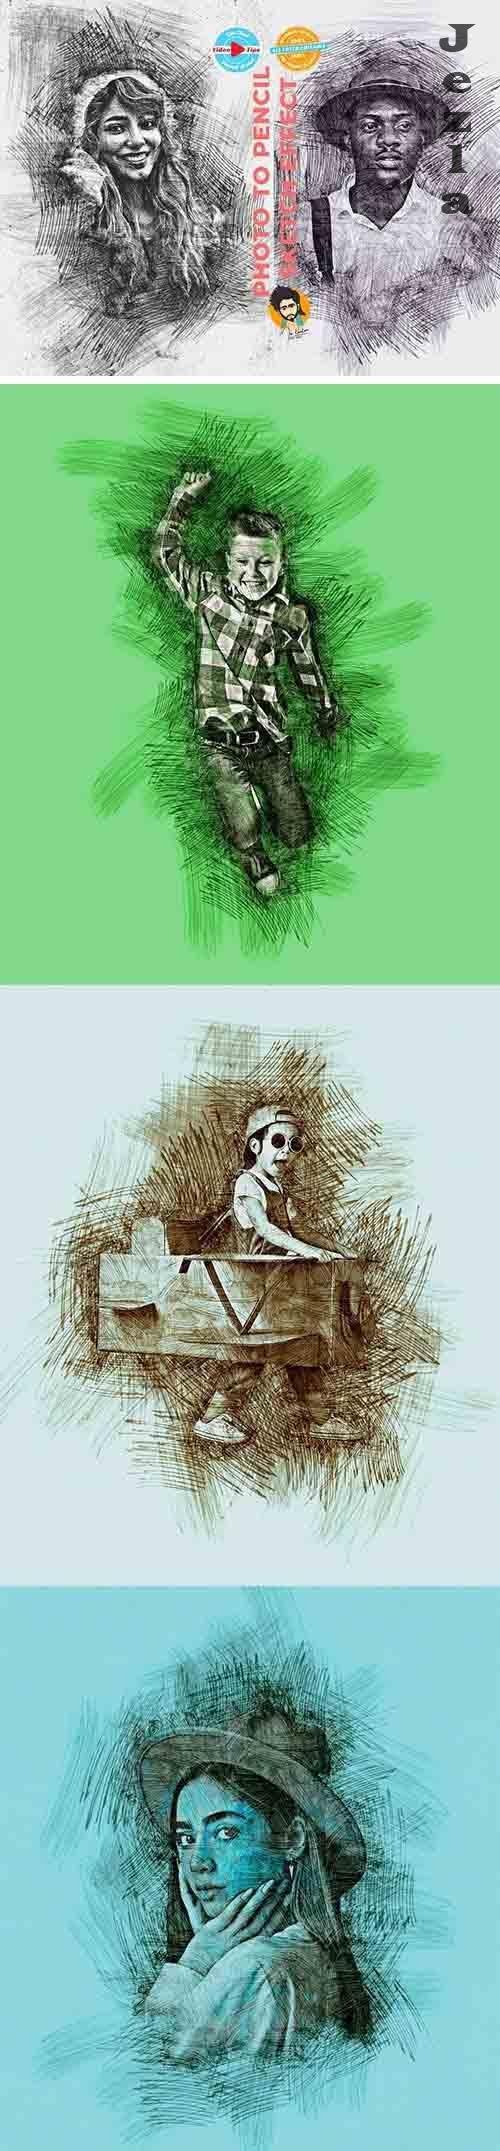 CreativeMarket - Photo to Pencil Sketch Effect 6117774